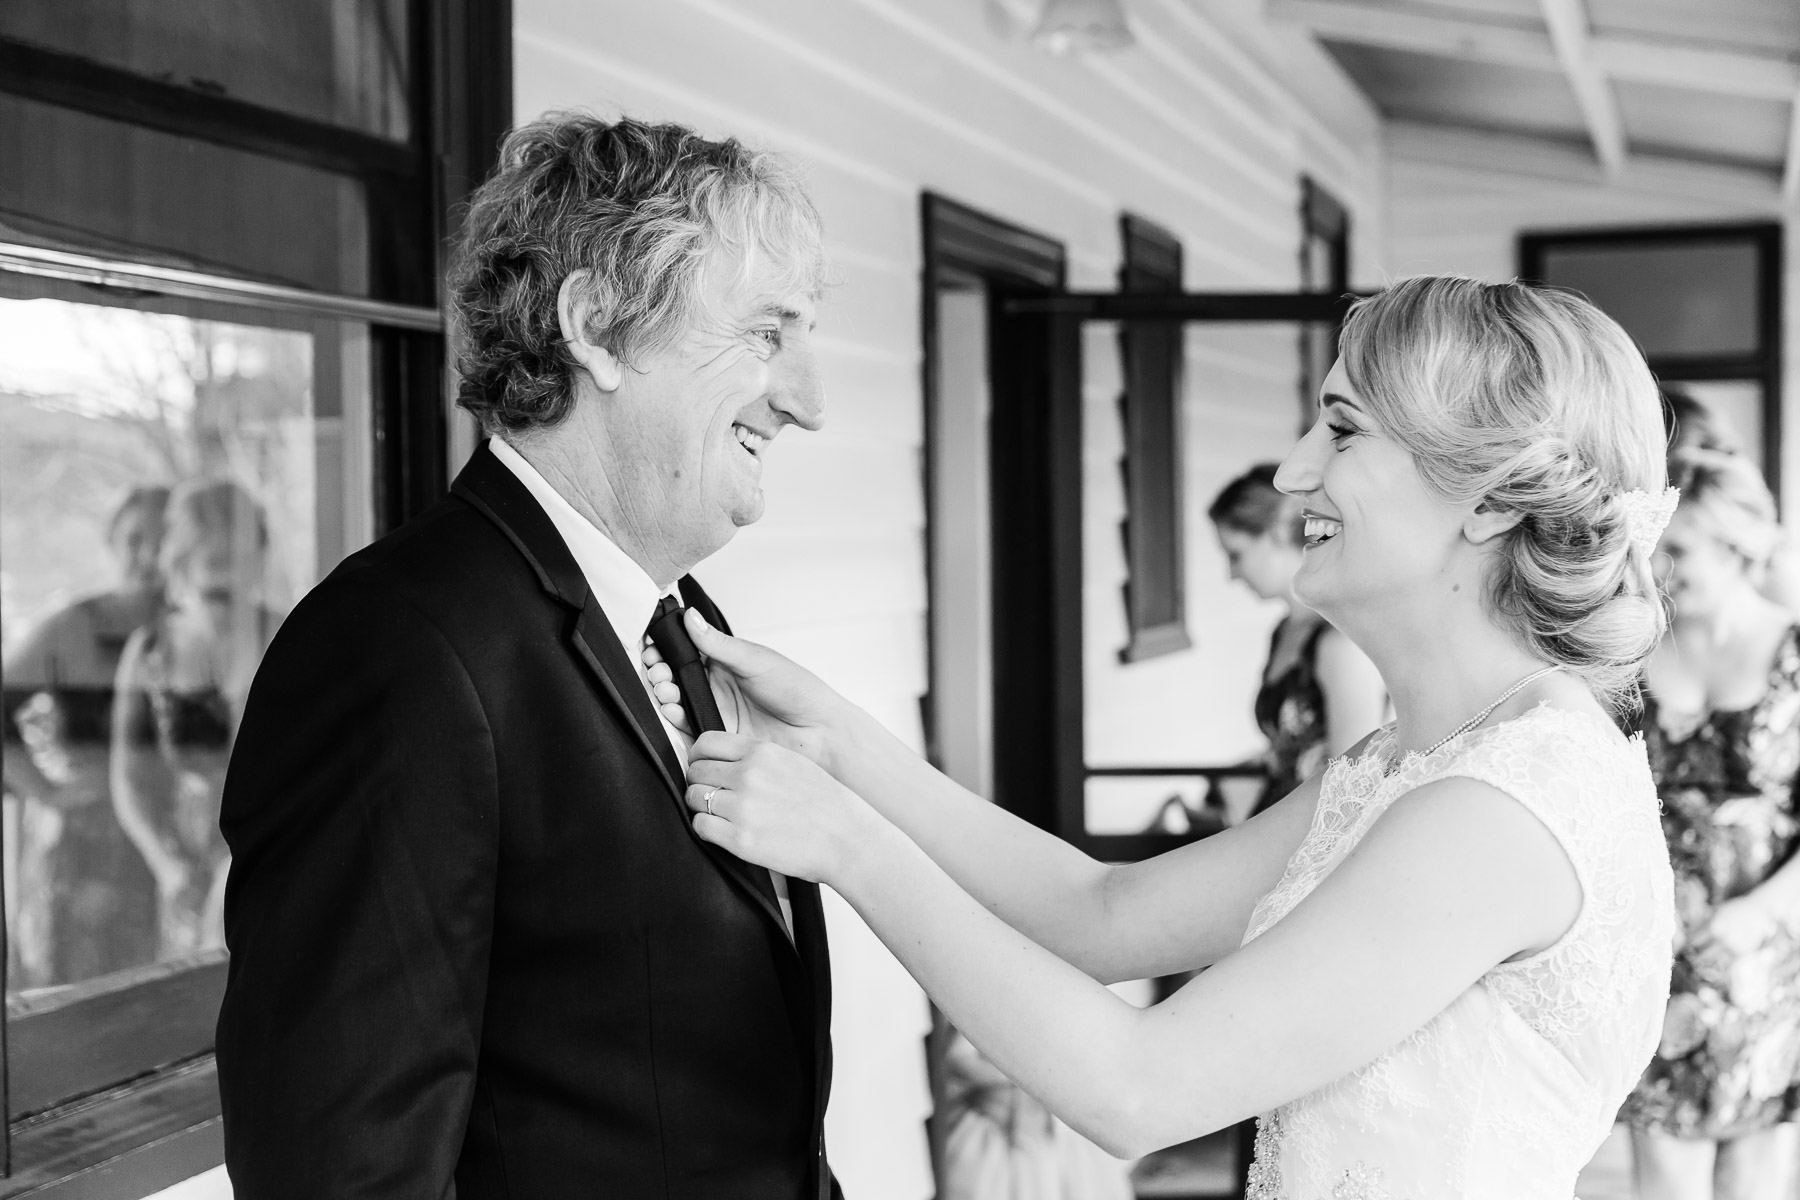 Marnie_and_Charlie_Yarra_Valley_Wedding_Blog-27.jpg